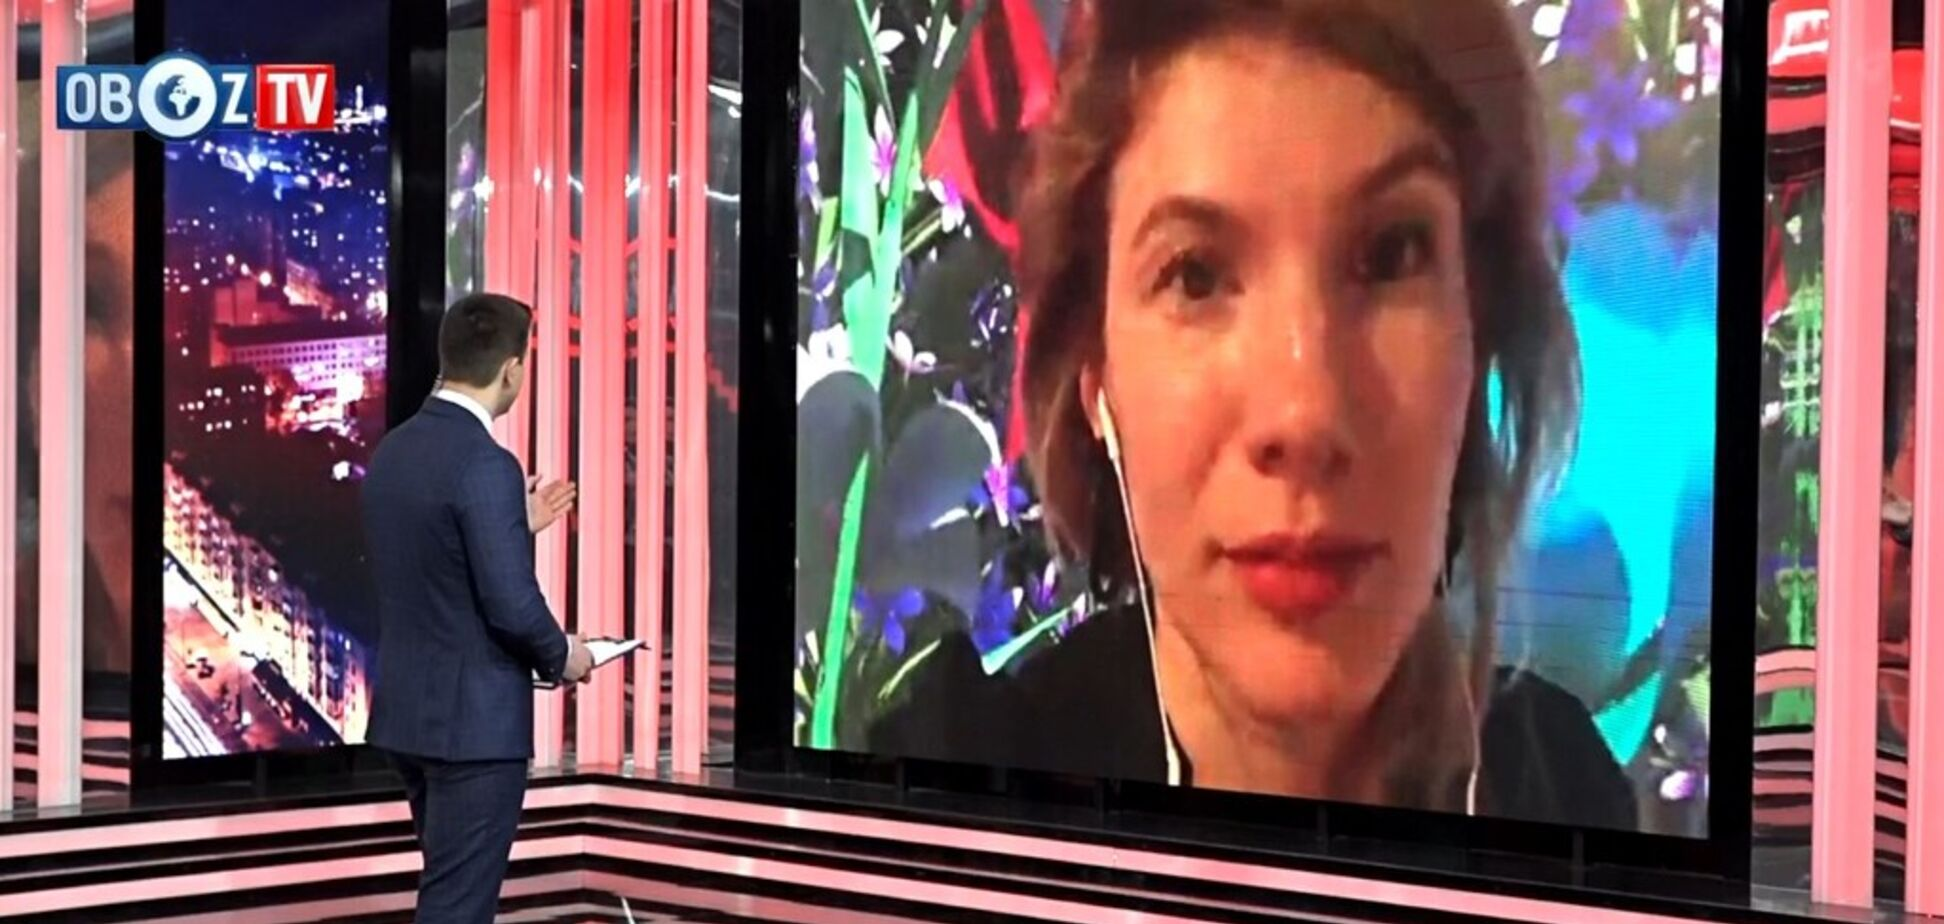 У кулуарах Давосу: Трамп і Грета Тунберг стали головними героями форуму